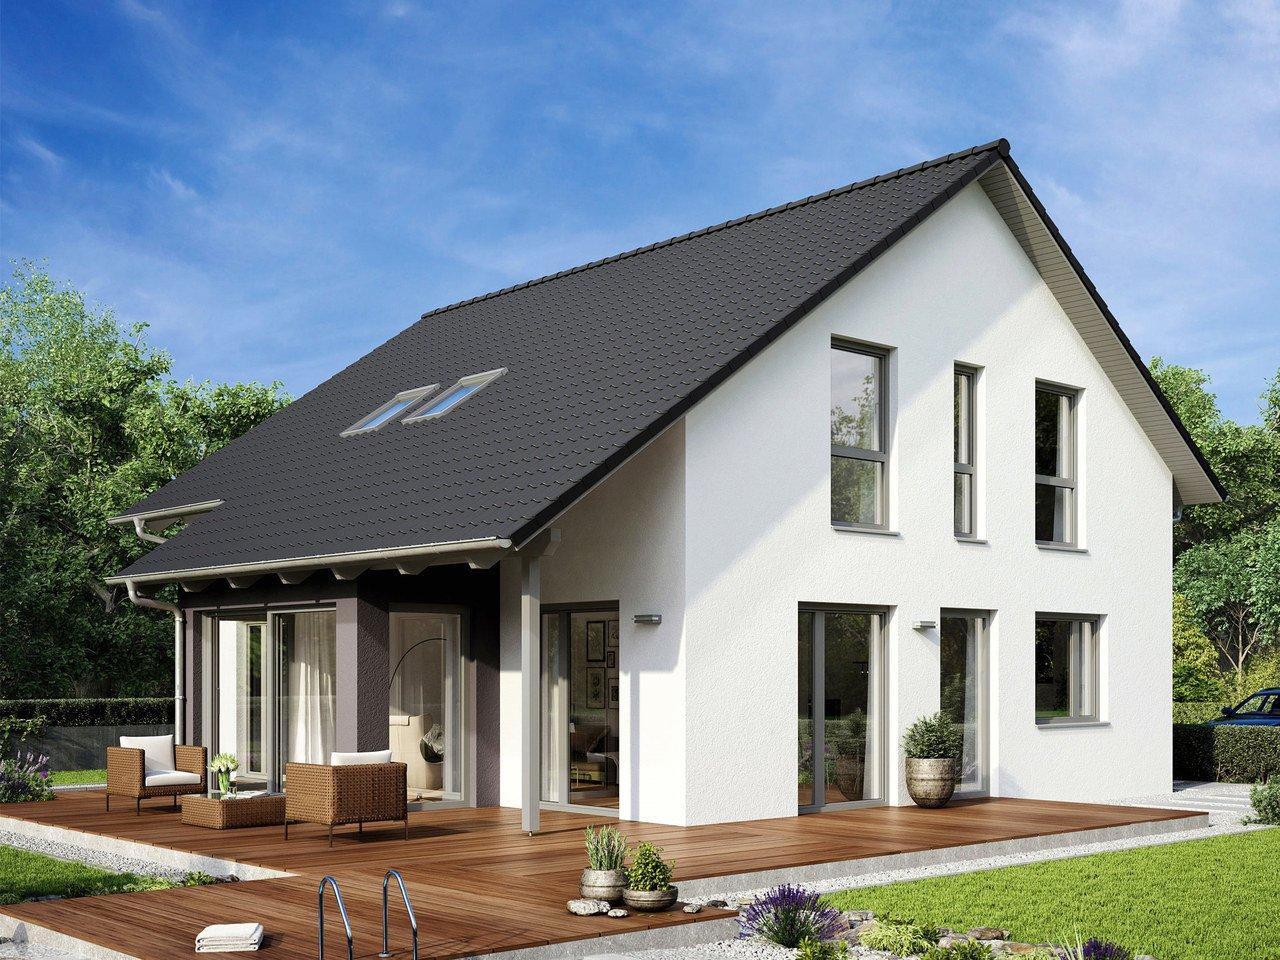 Hanse Haus Variant : satteldachhaus variant 35 174 hanse haus ~ Yuntae.com Dekorationen Ideen